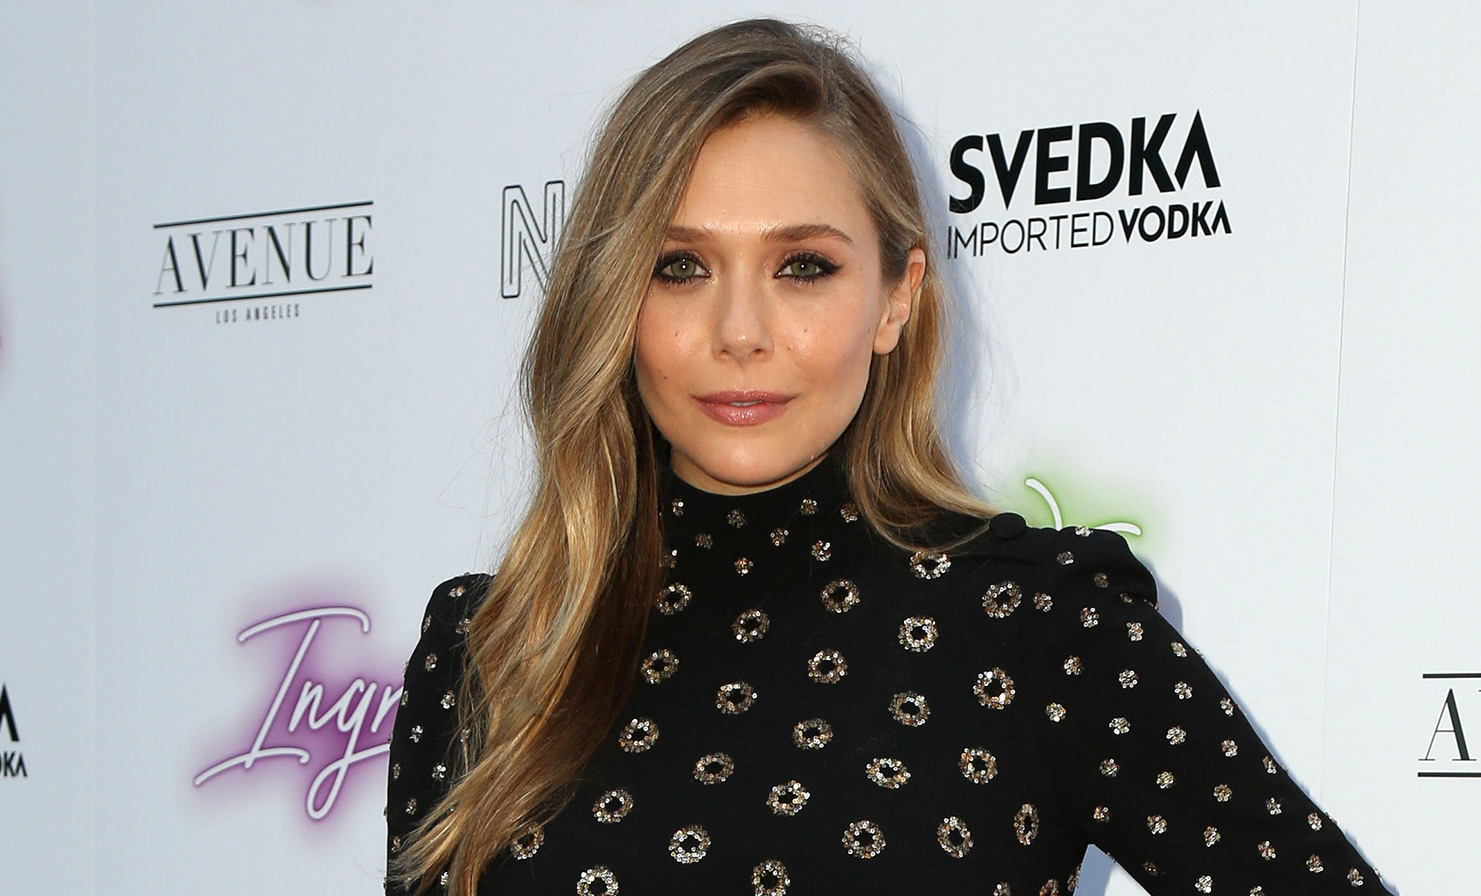 Elizabeth Olsen Joined Instagram for the Financial Opportunities